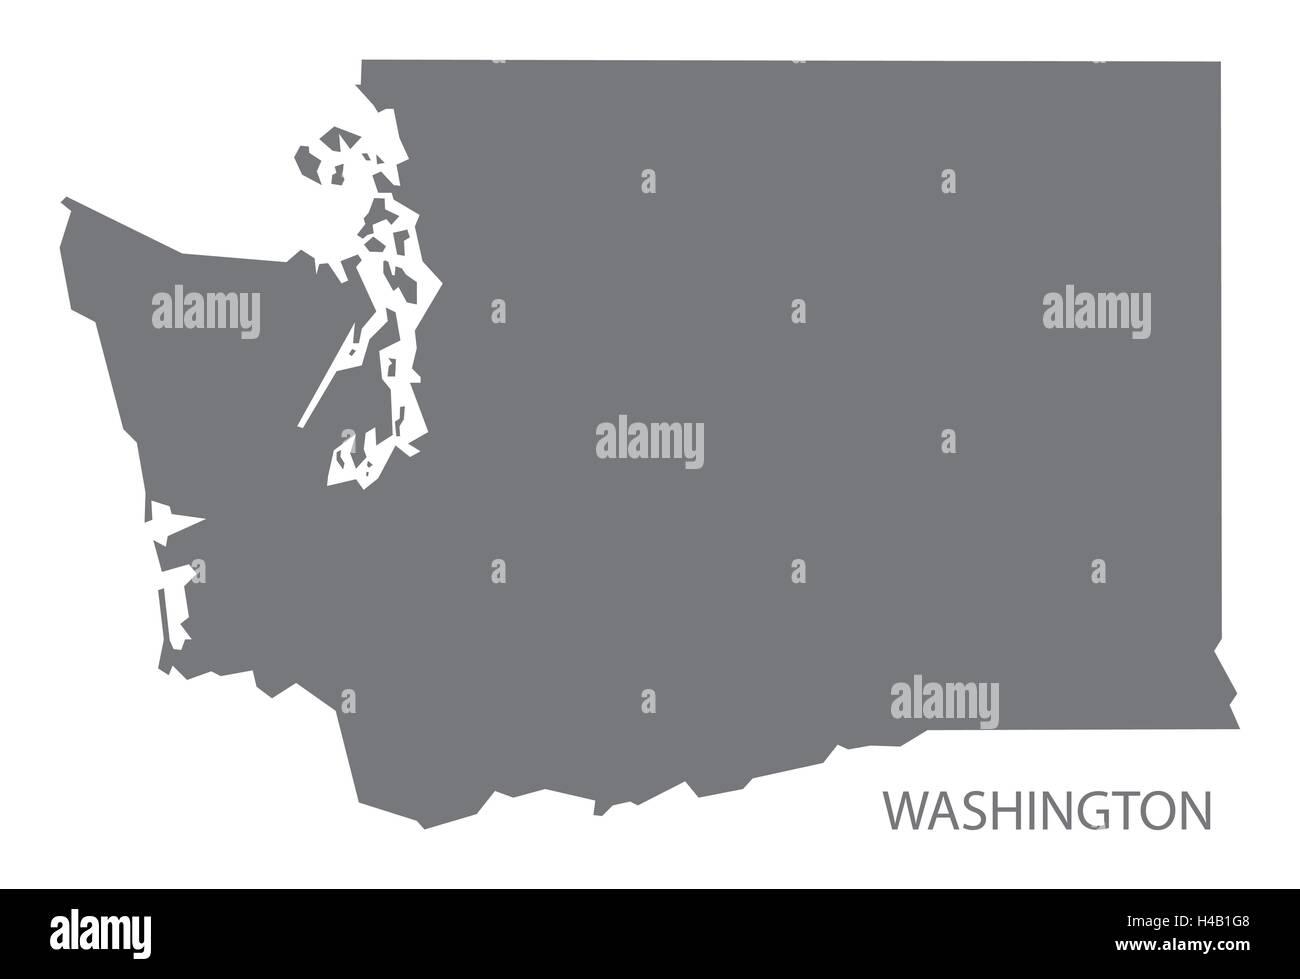 Washington USA Map in grey - Stock Vector